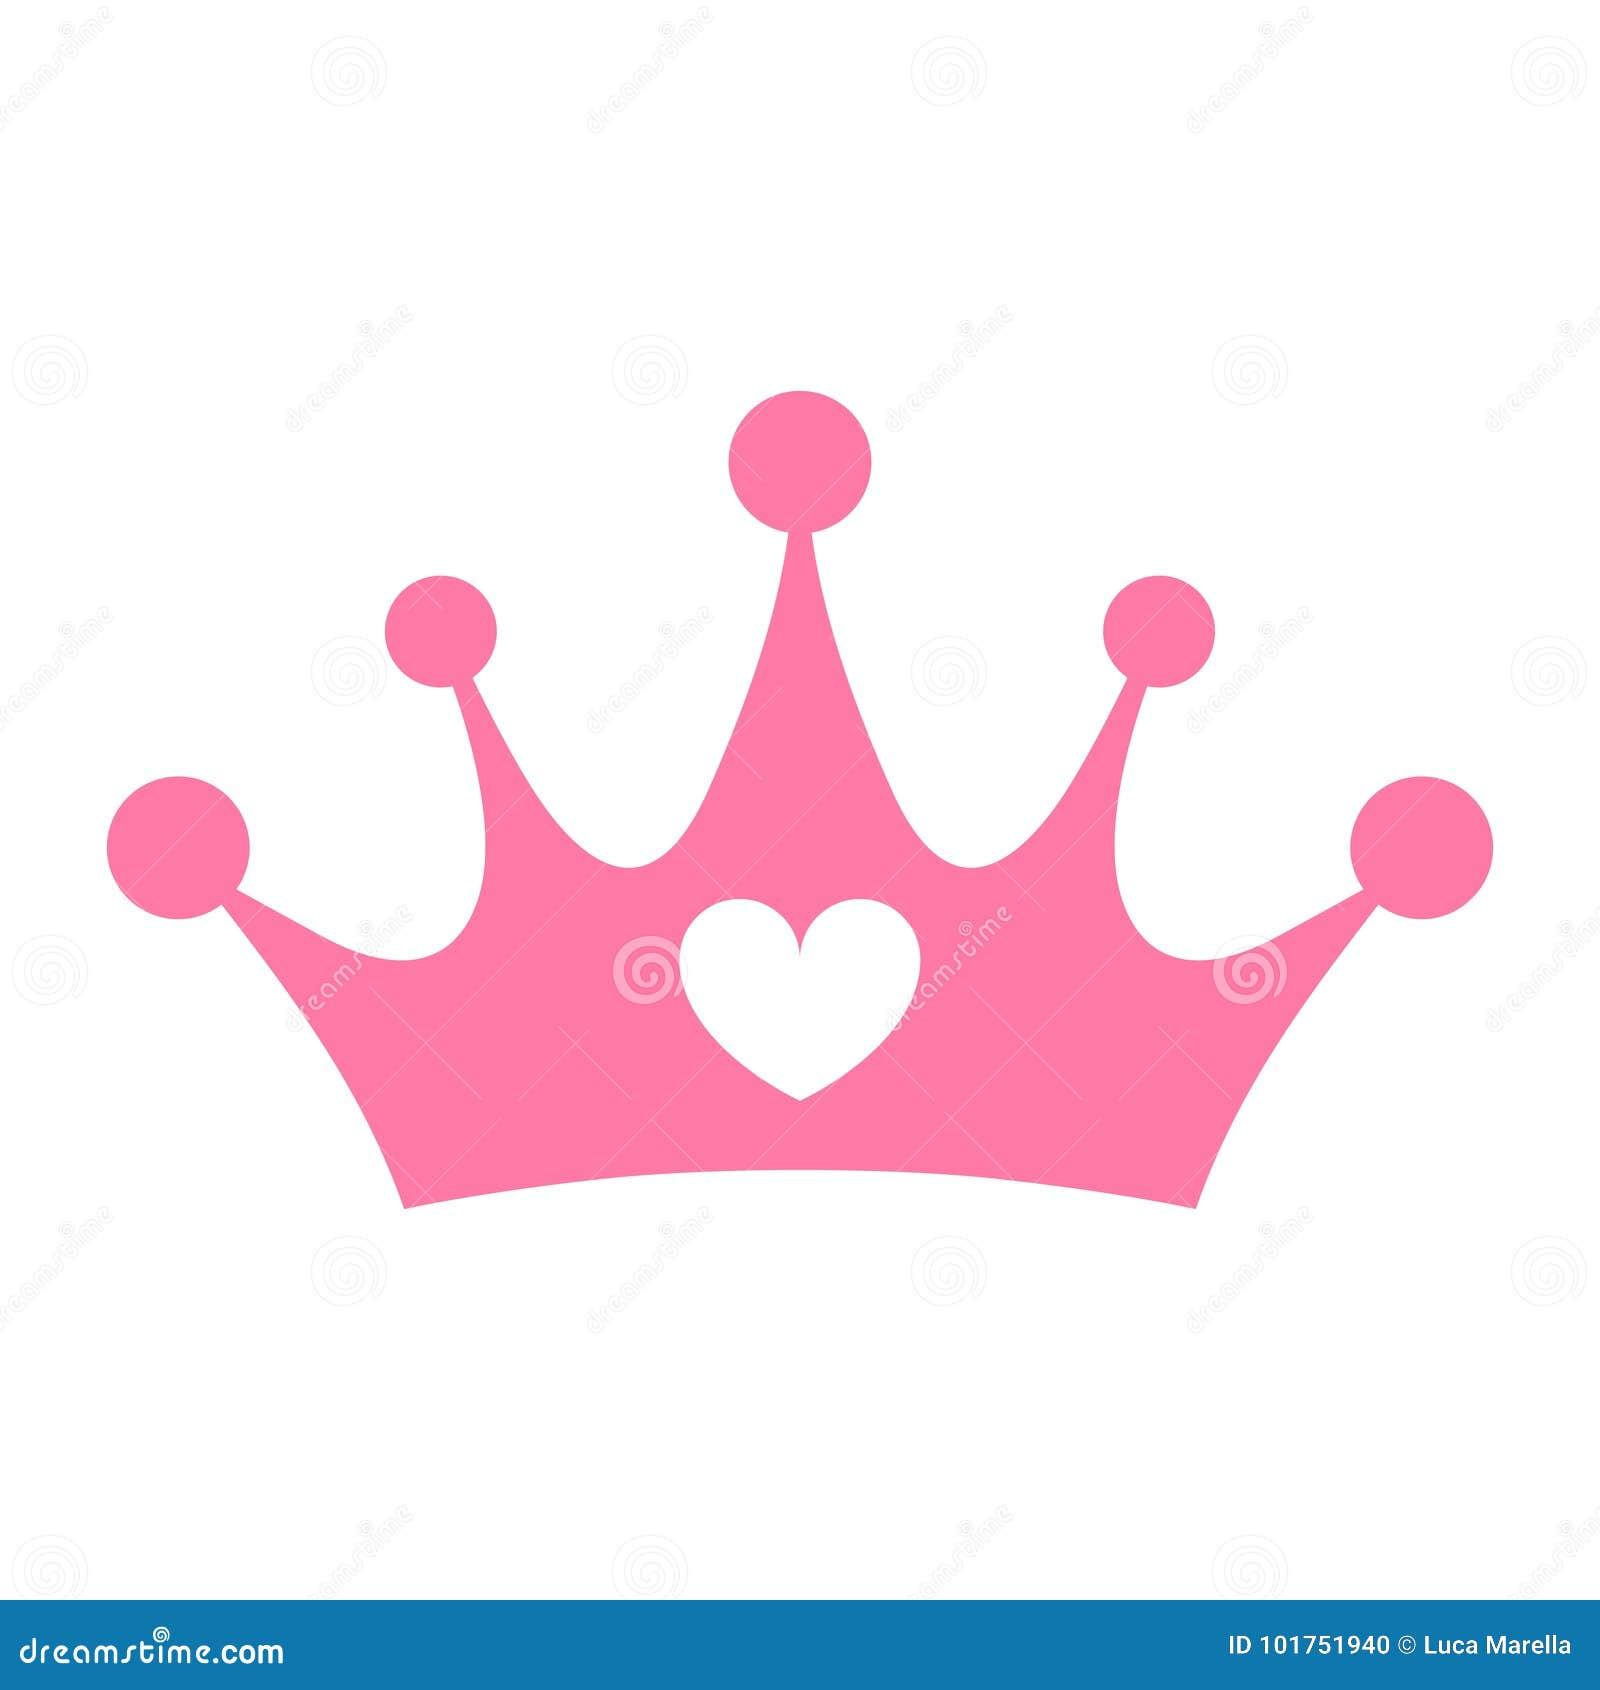 Prinzessin Crown